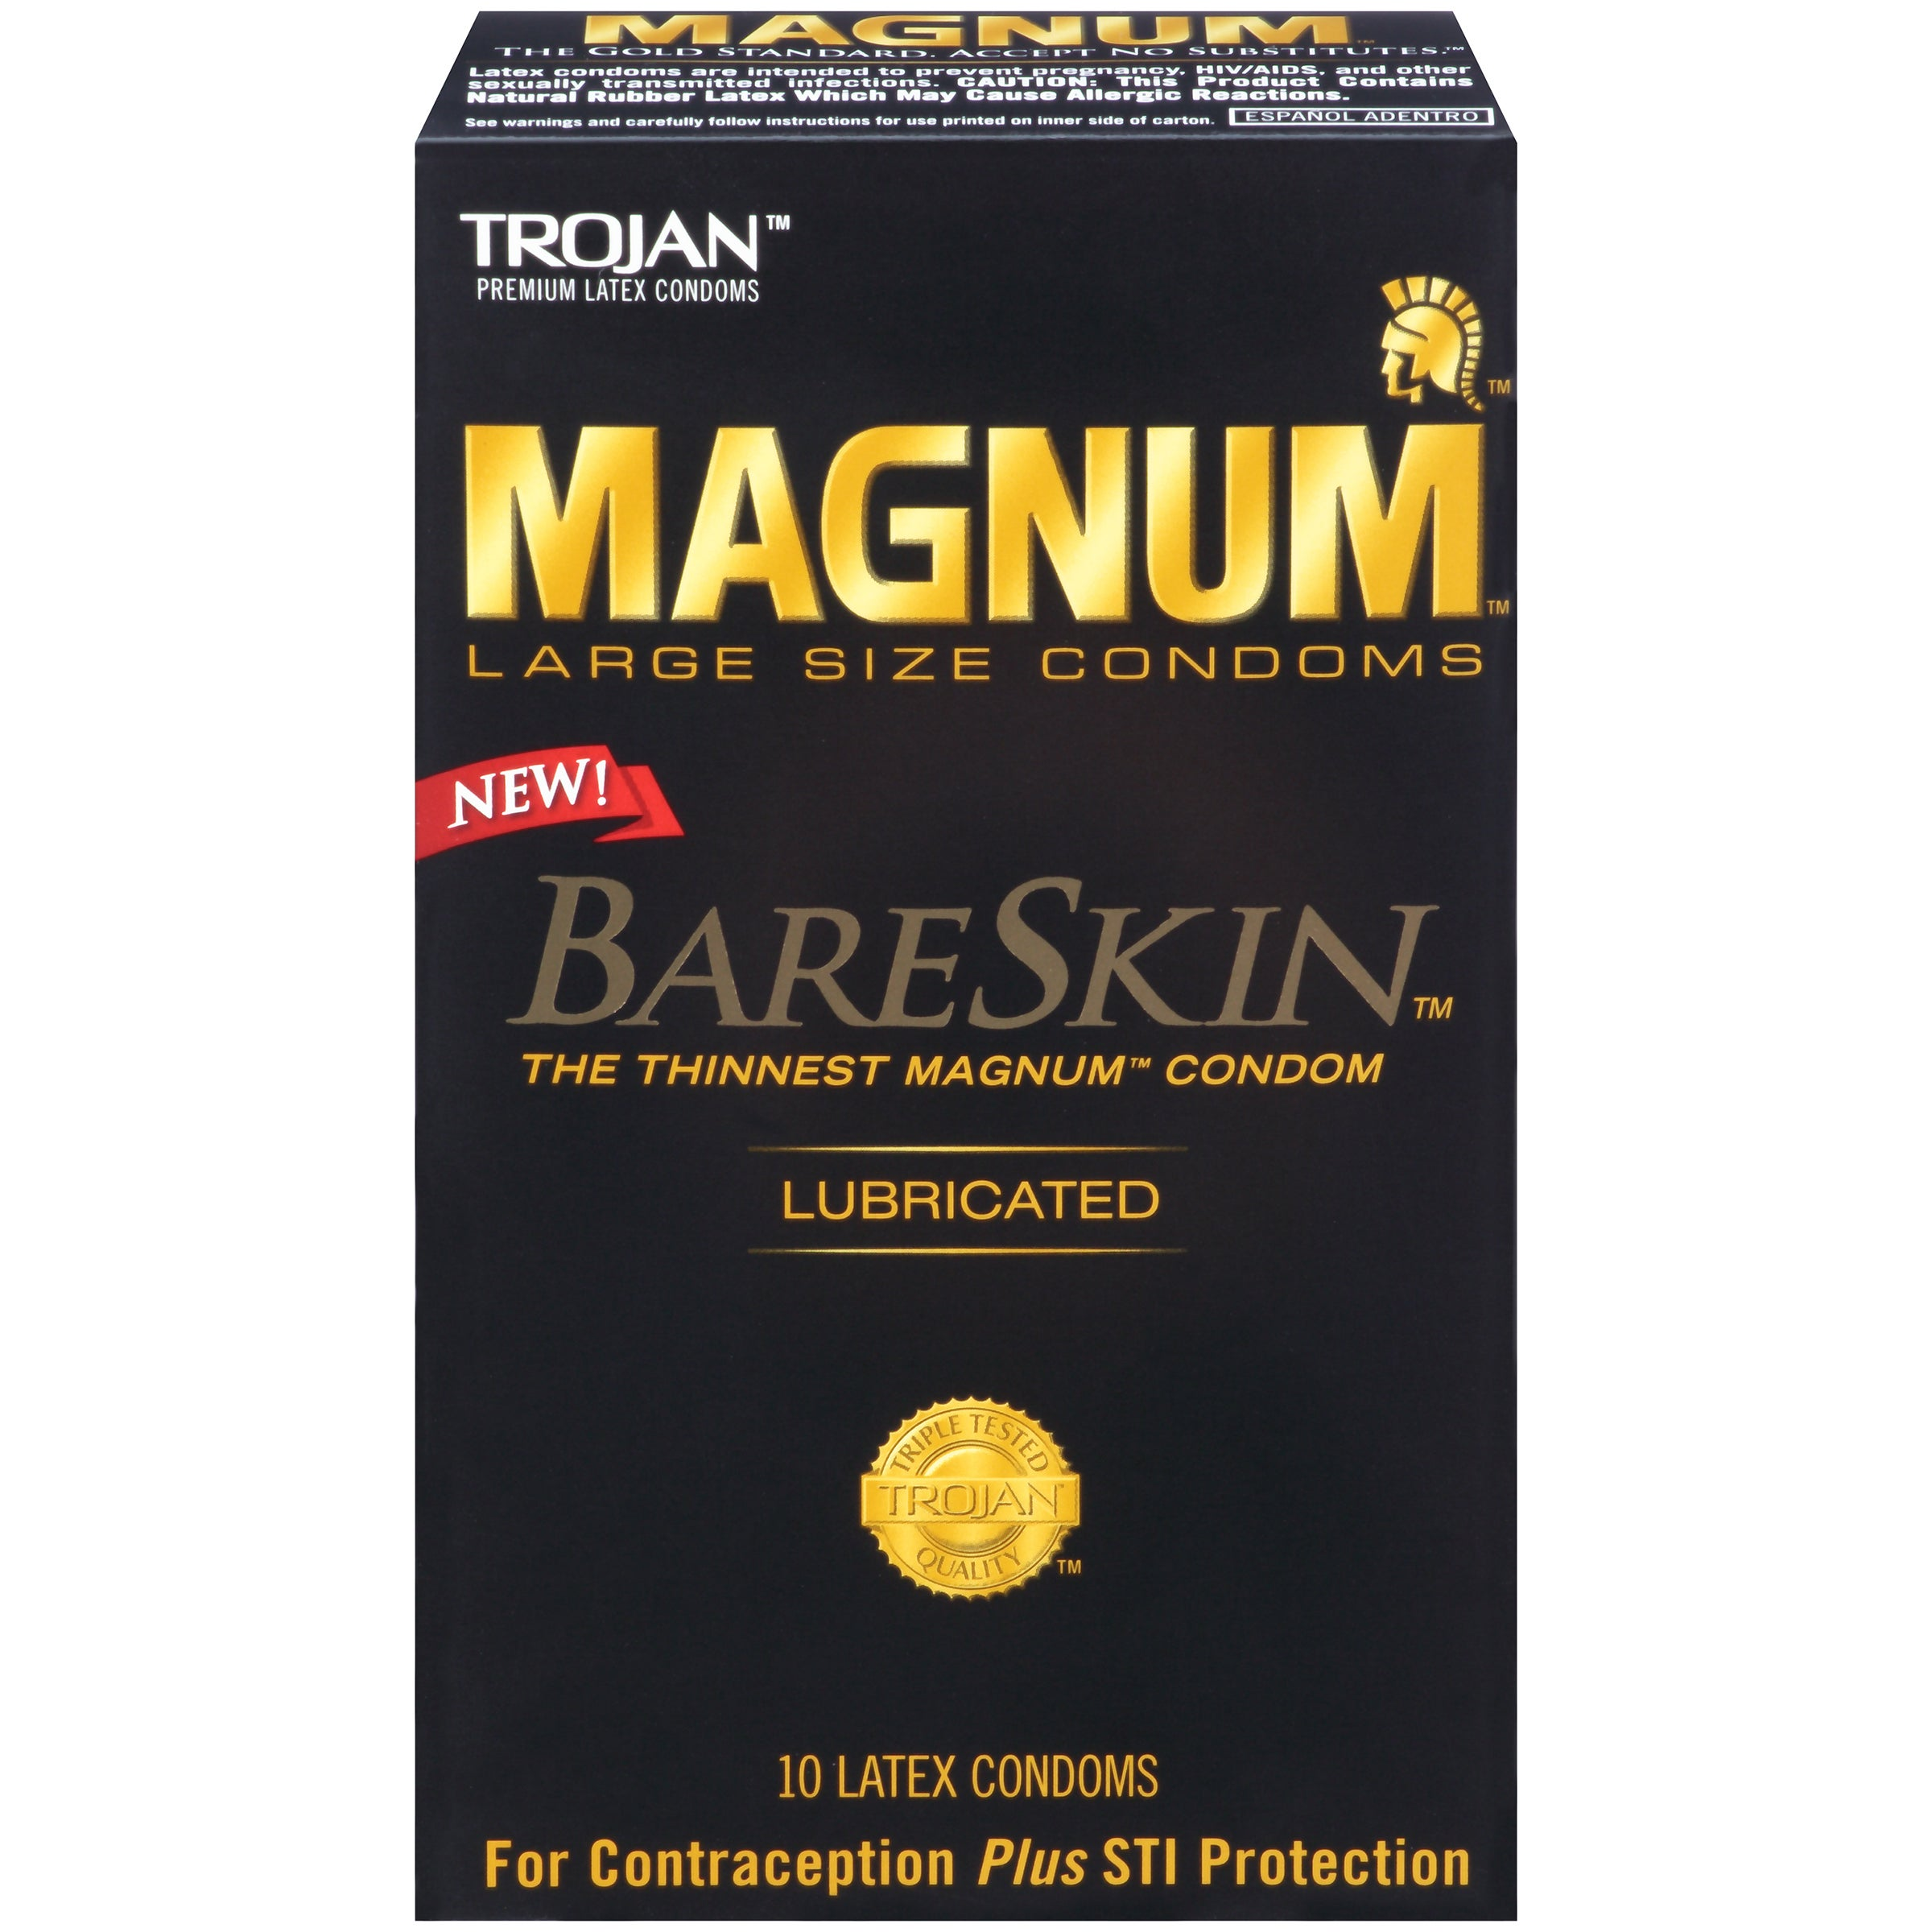 Trojan Magnum Bareskin Lubricated Condoms (Pack of 10)